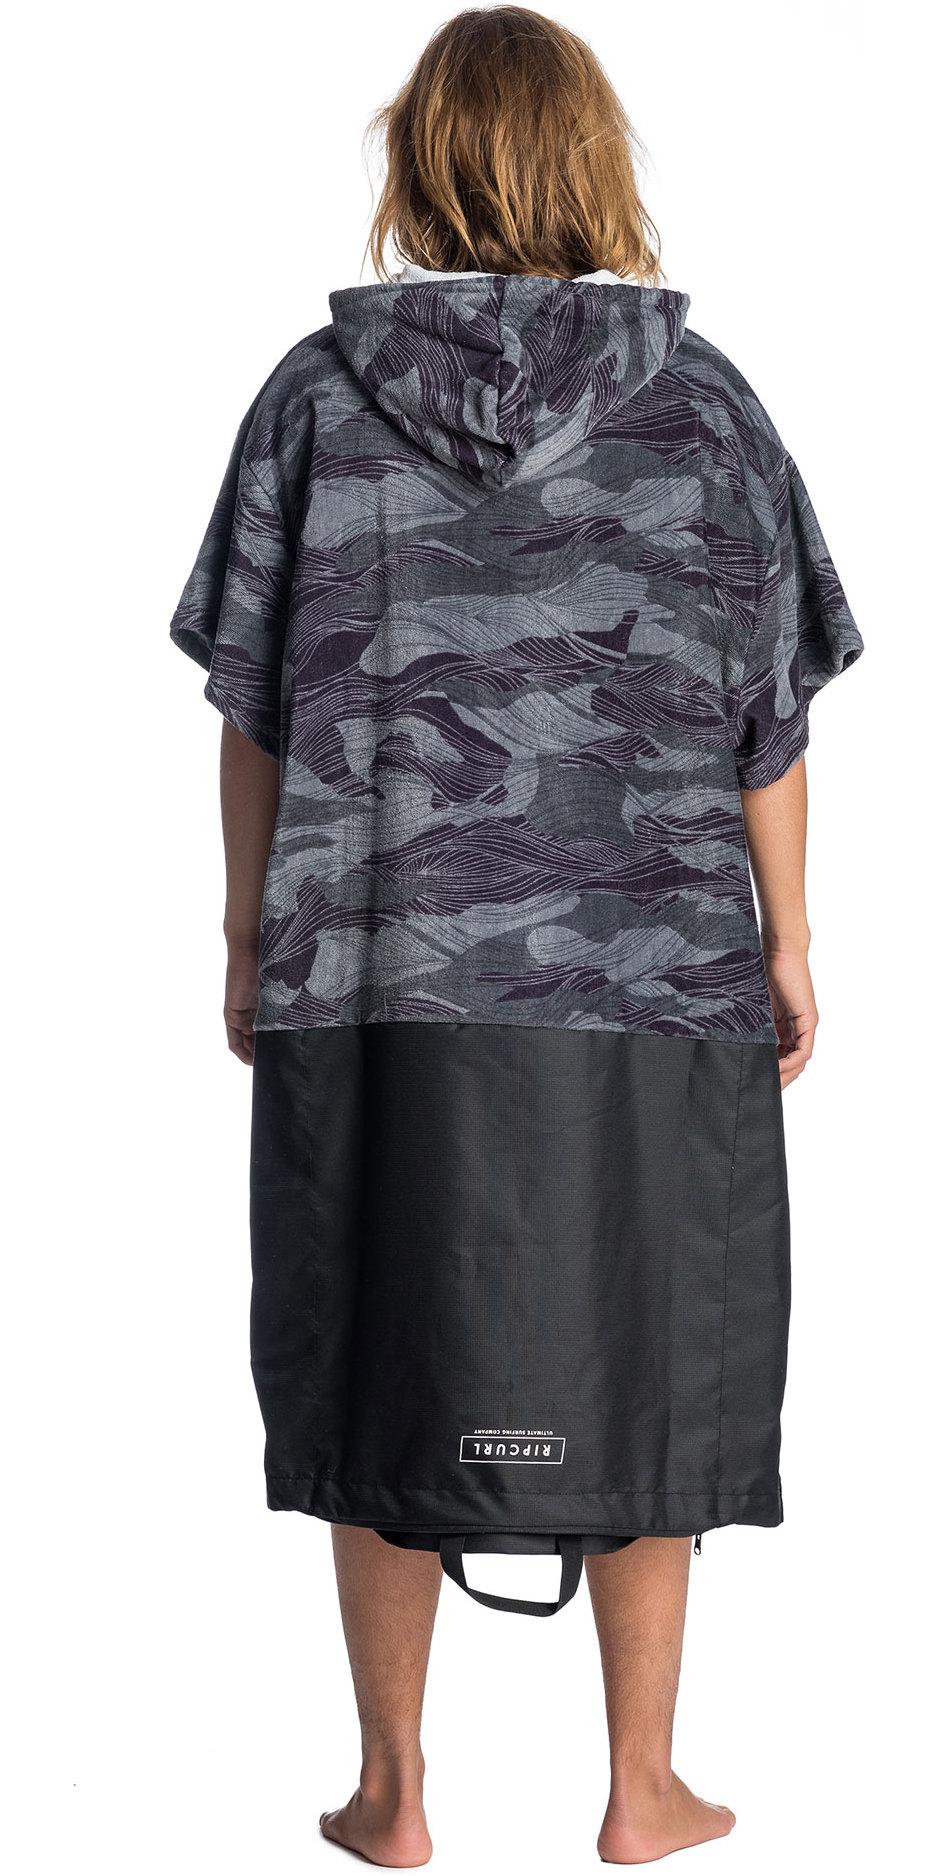 2019 Rip Curl Newy Change Robe / Poncho Khaki CTWAV4